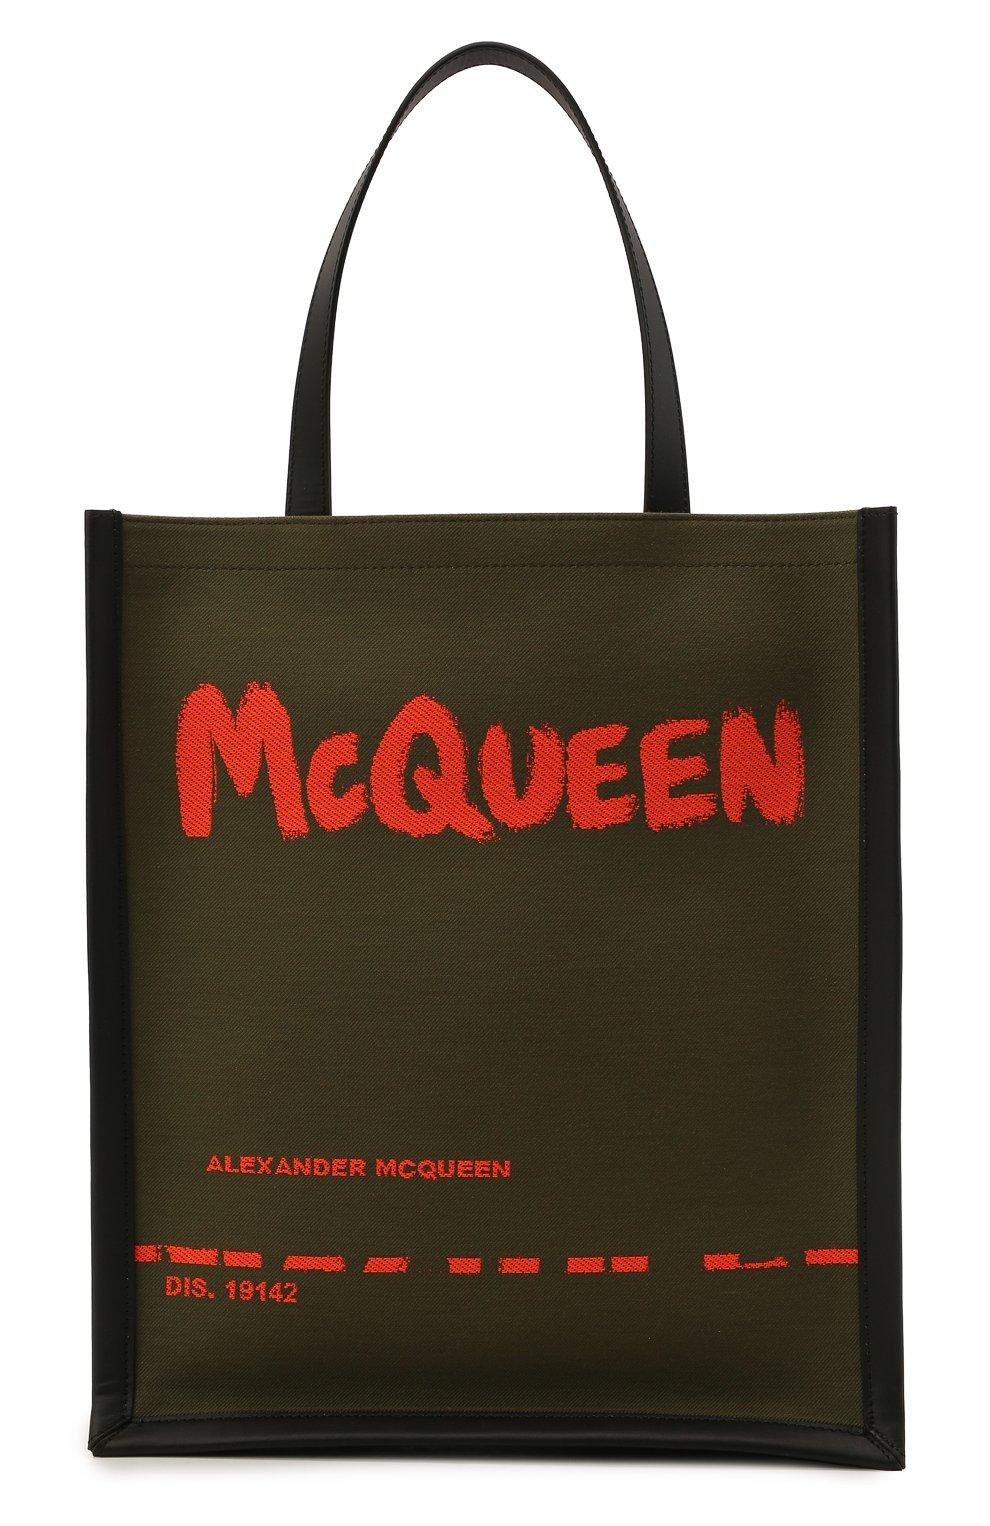 Мужская текстильная сумка-шопер ALEXANDER MCQUEEN хаки цвета, арт. 653165/2B410 | Фото 1